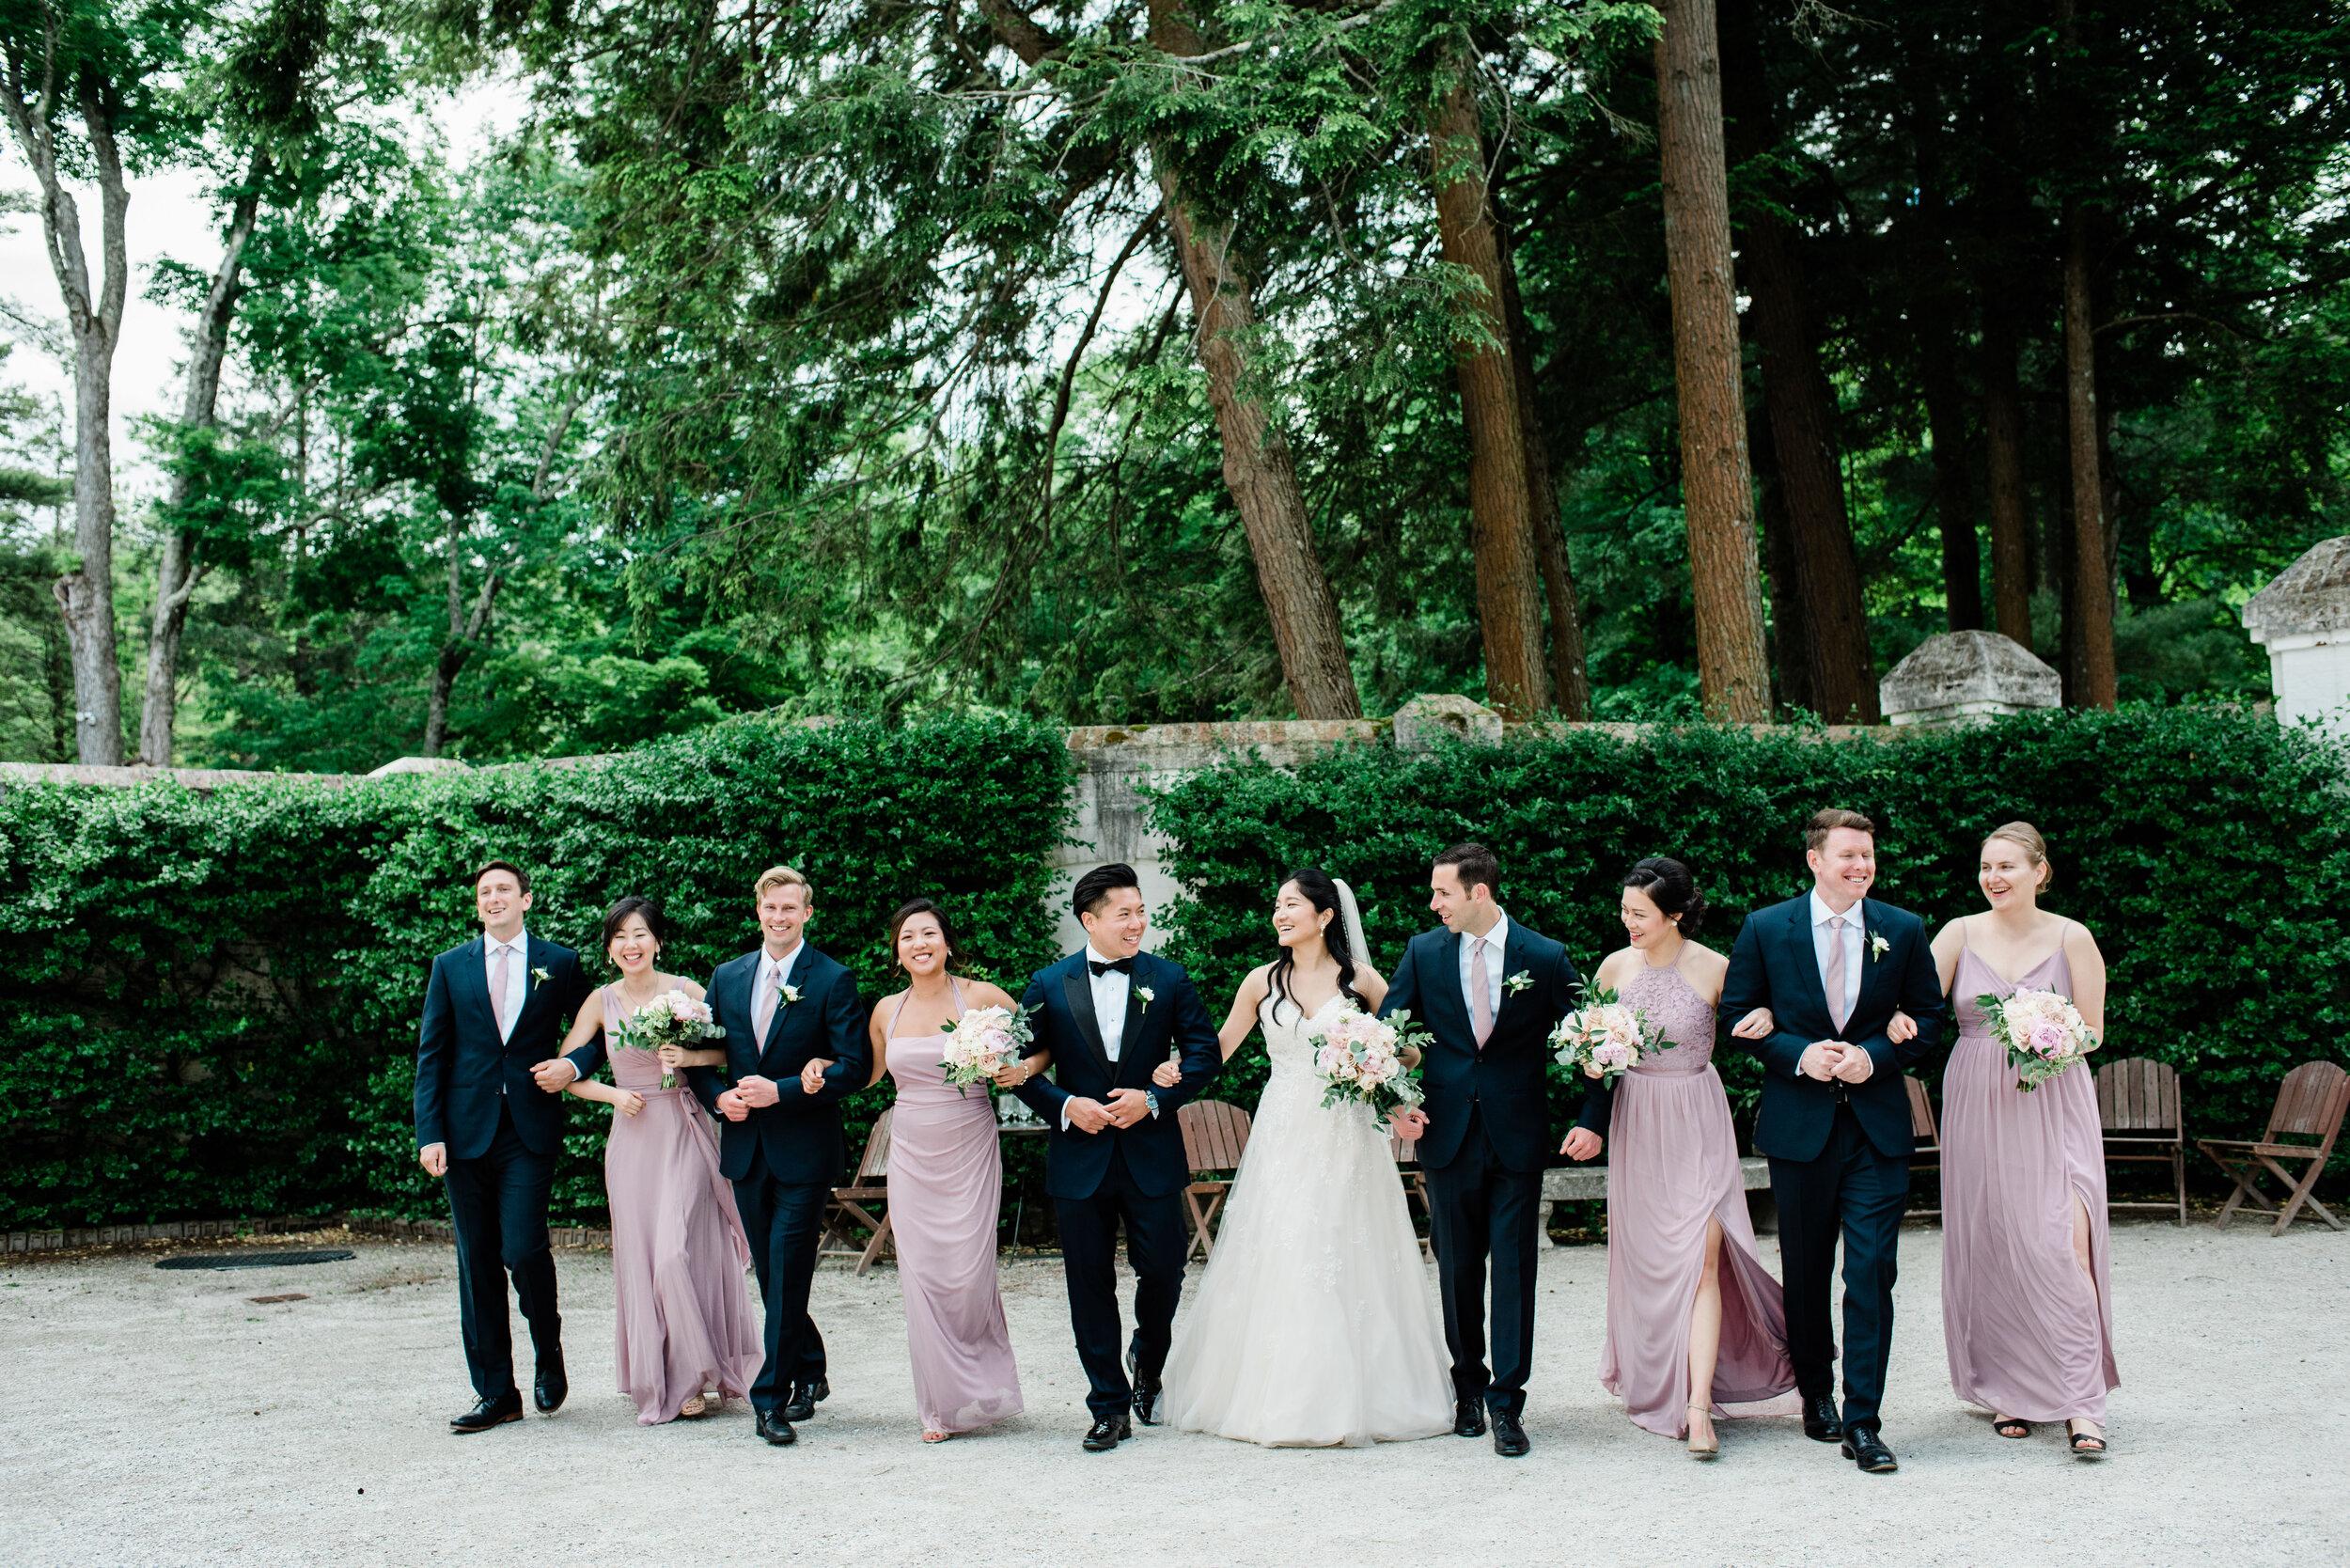 Weddings at the Mount Berkshires